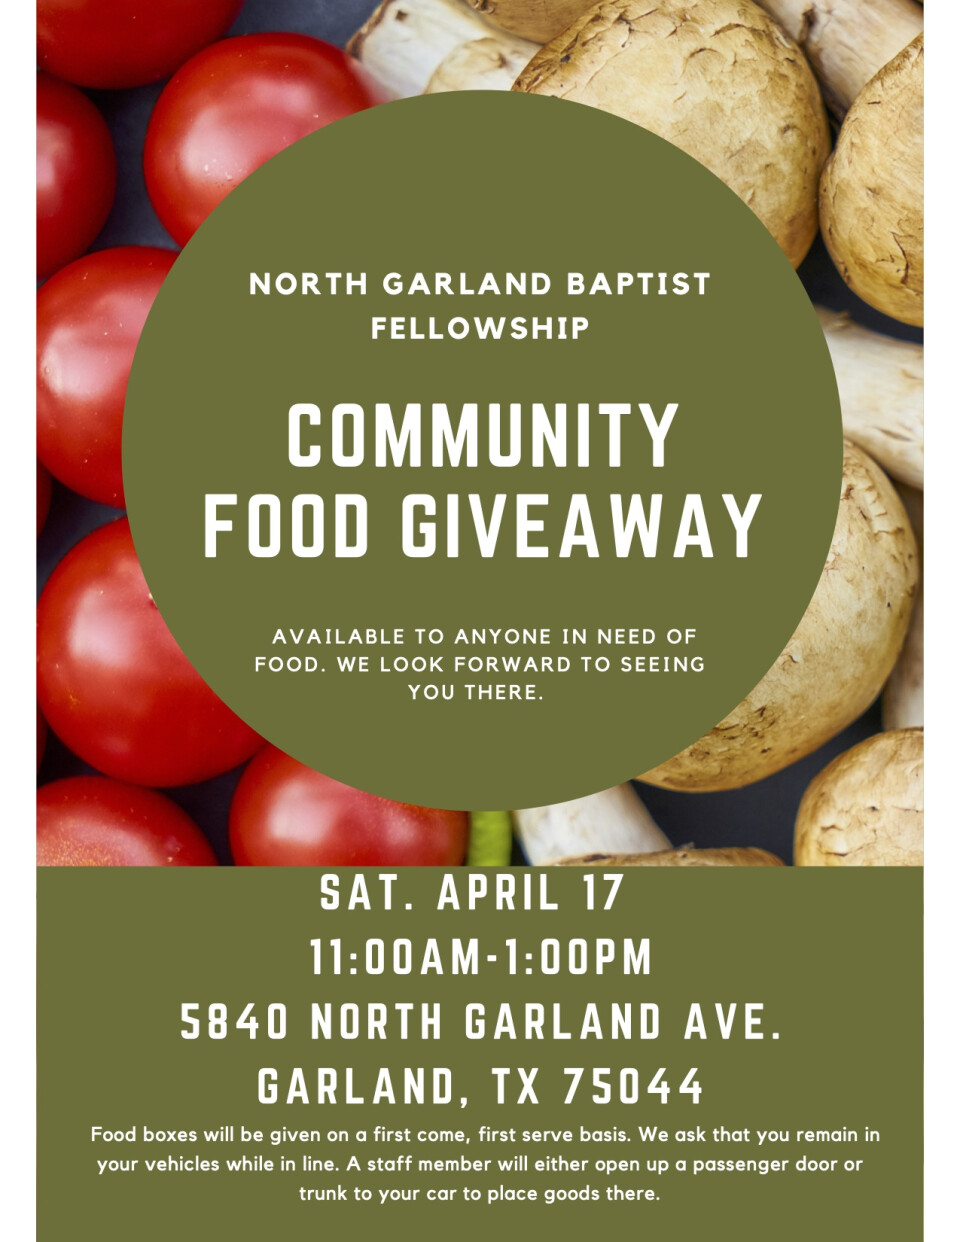 NGBF Community Food Giveaway